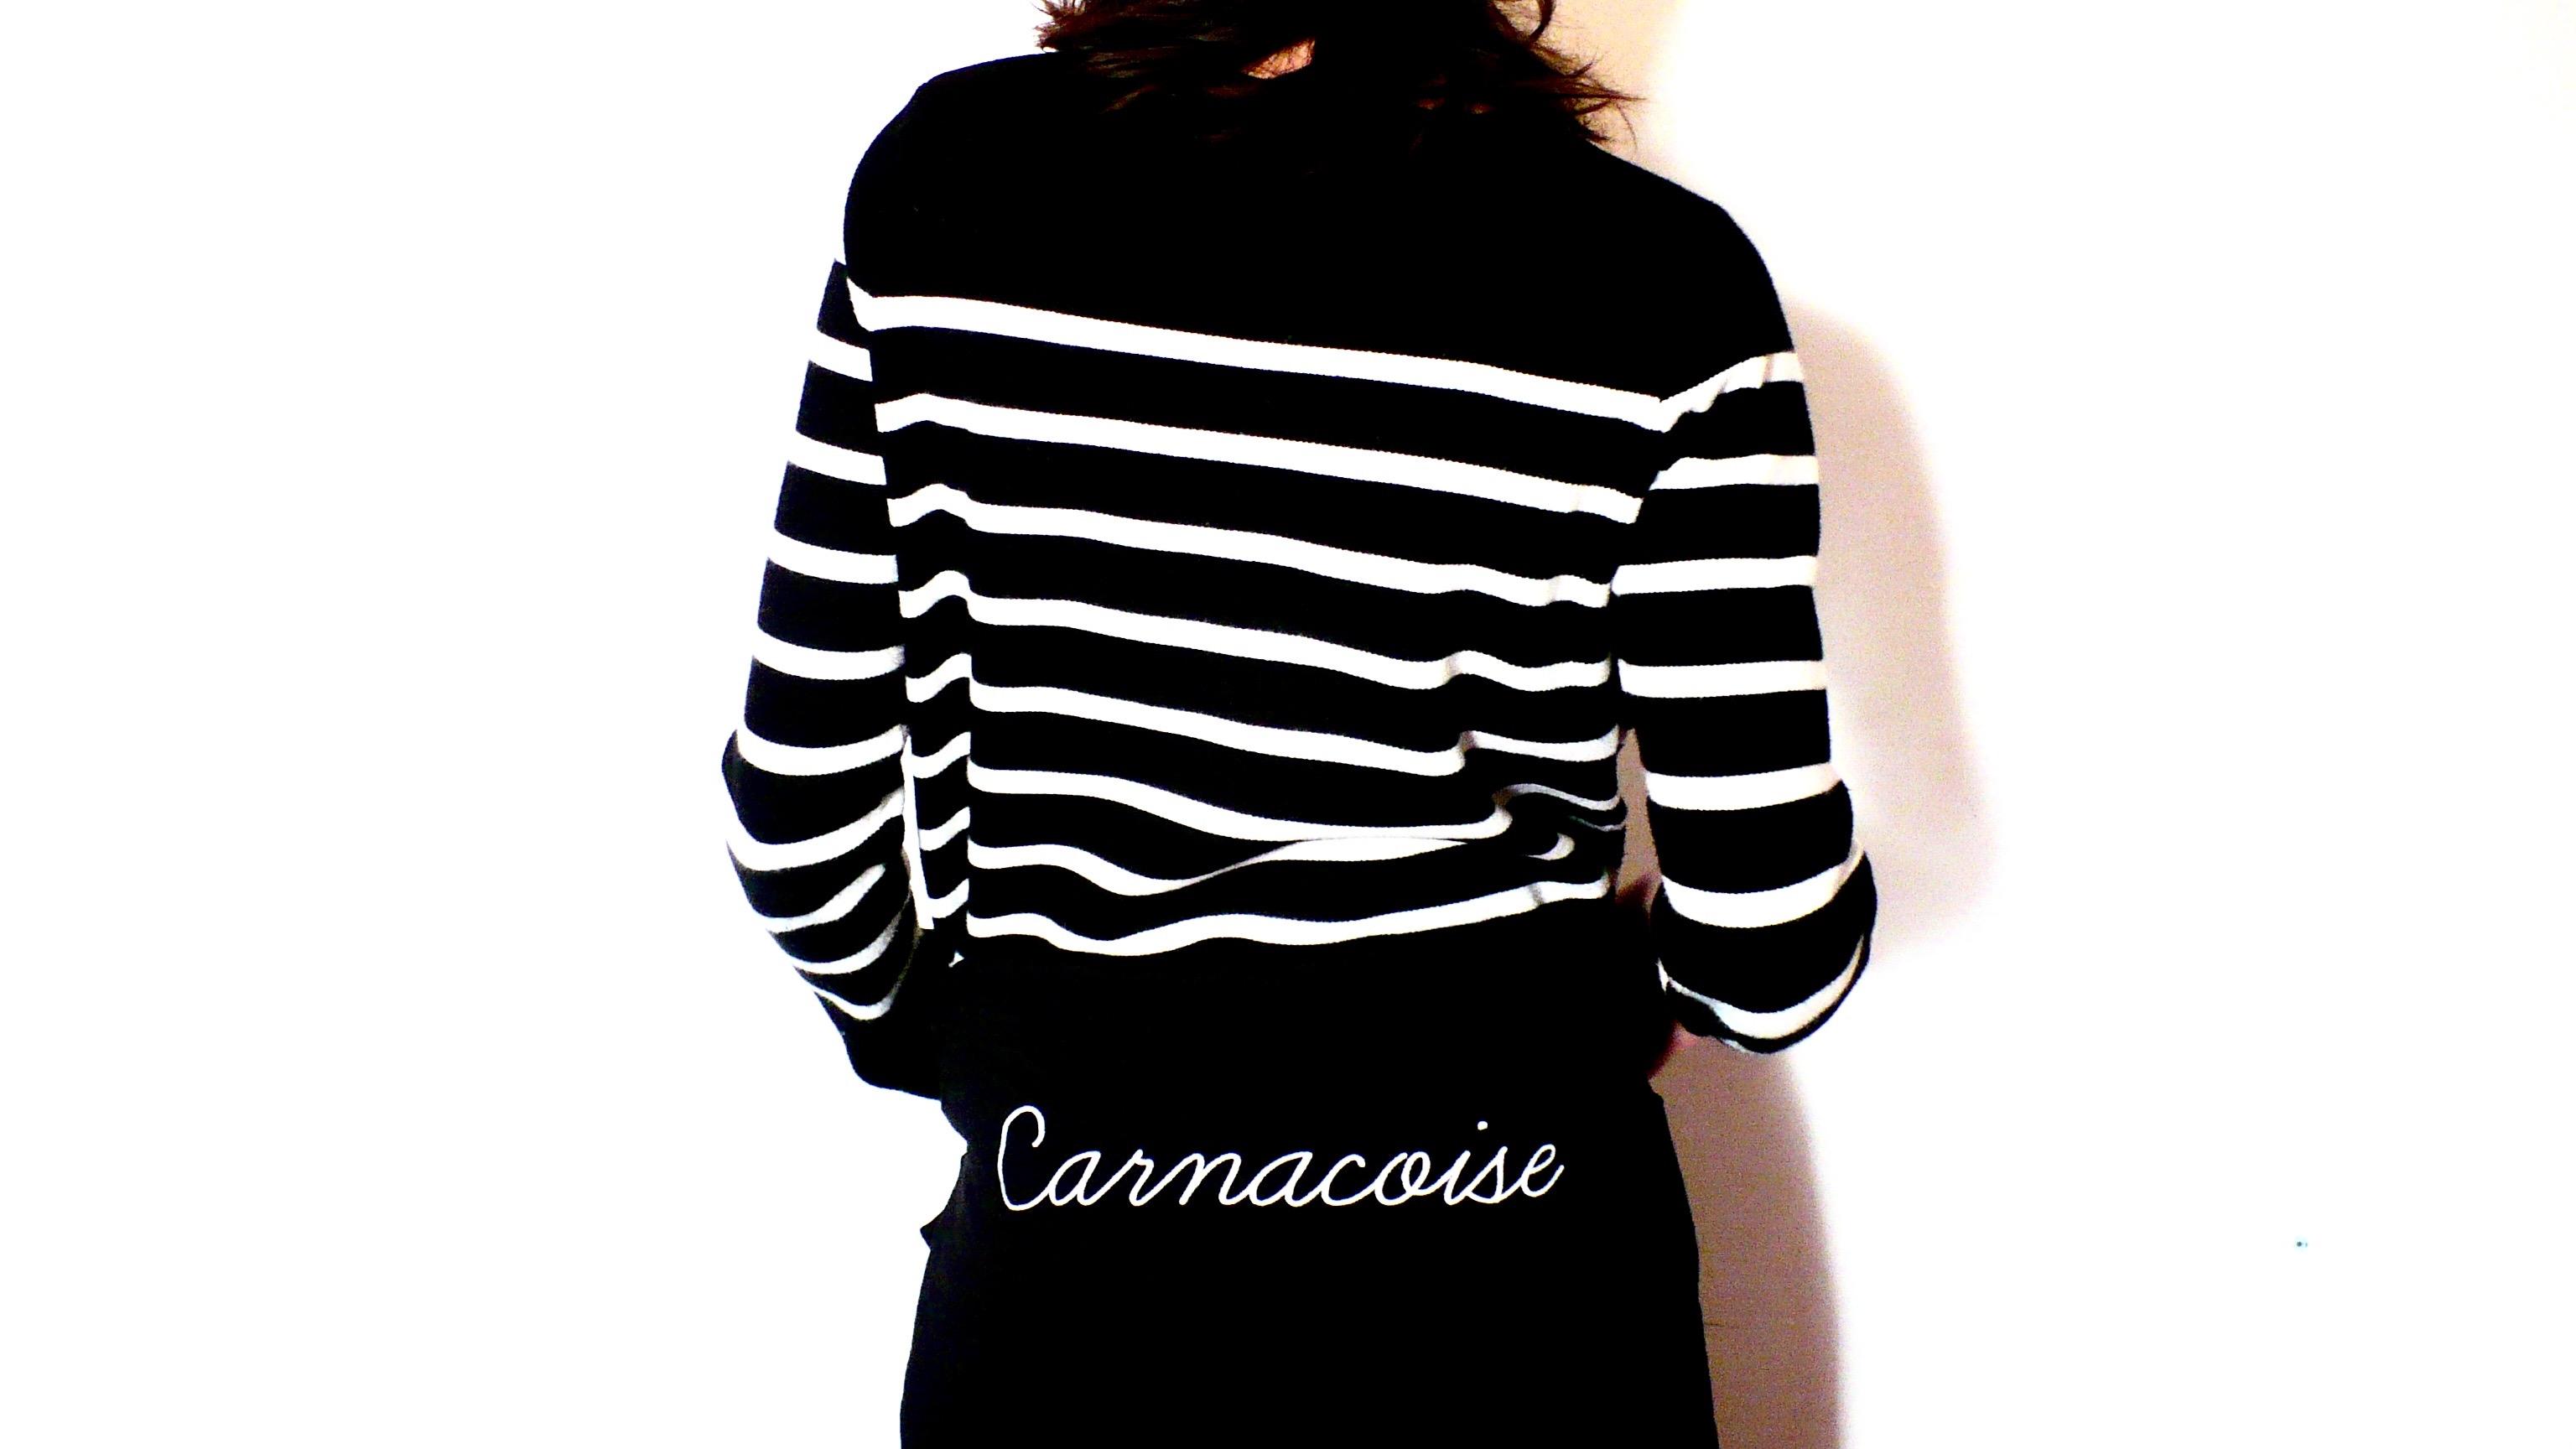 Carnacoise